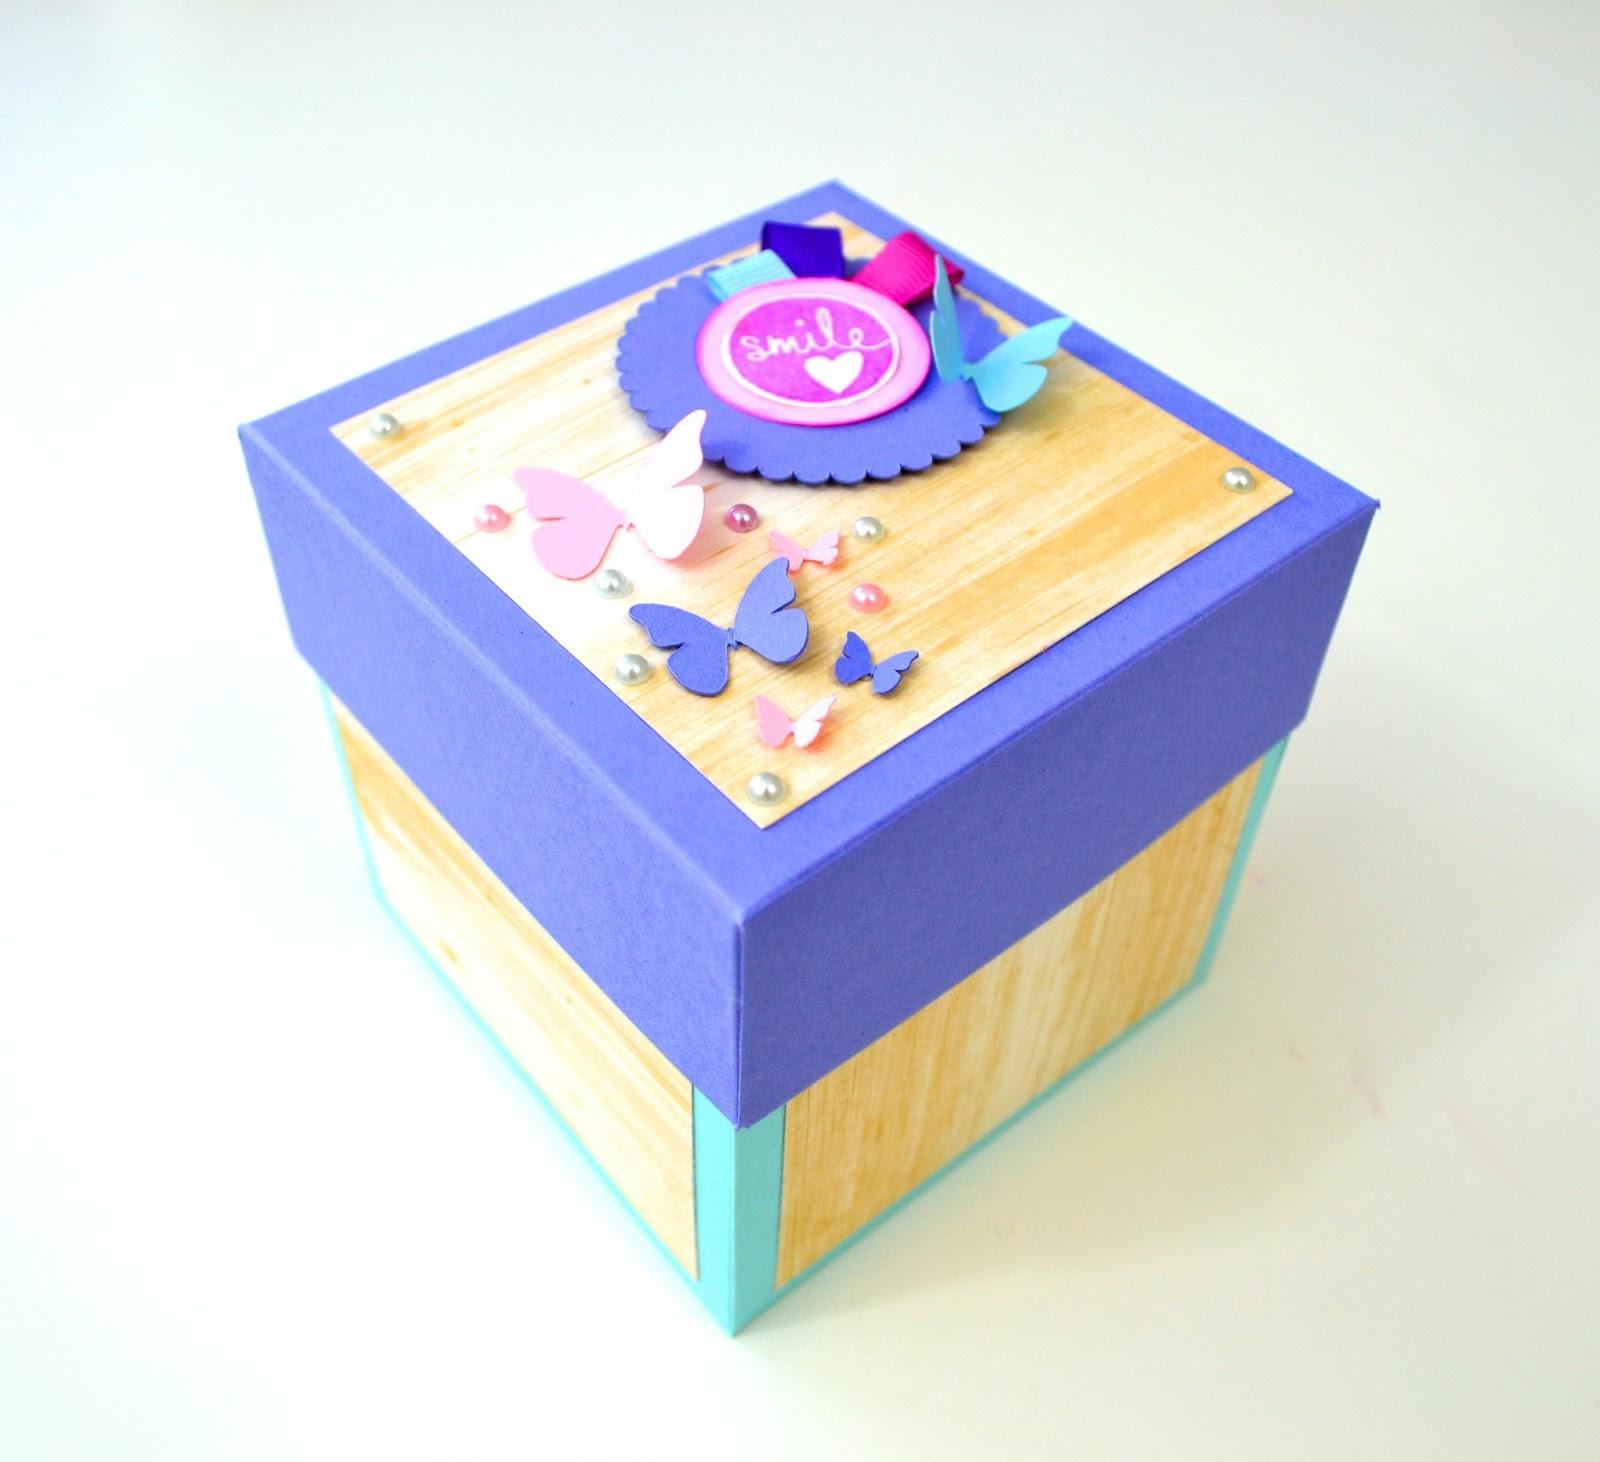 Giulia's Art - DIY Paper Crafts: New Exploding Box model ... - photo#48